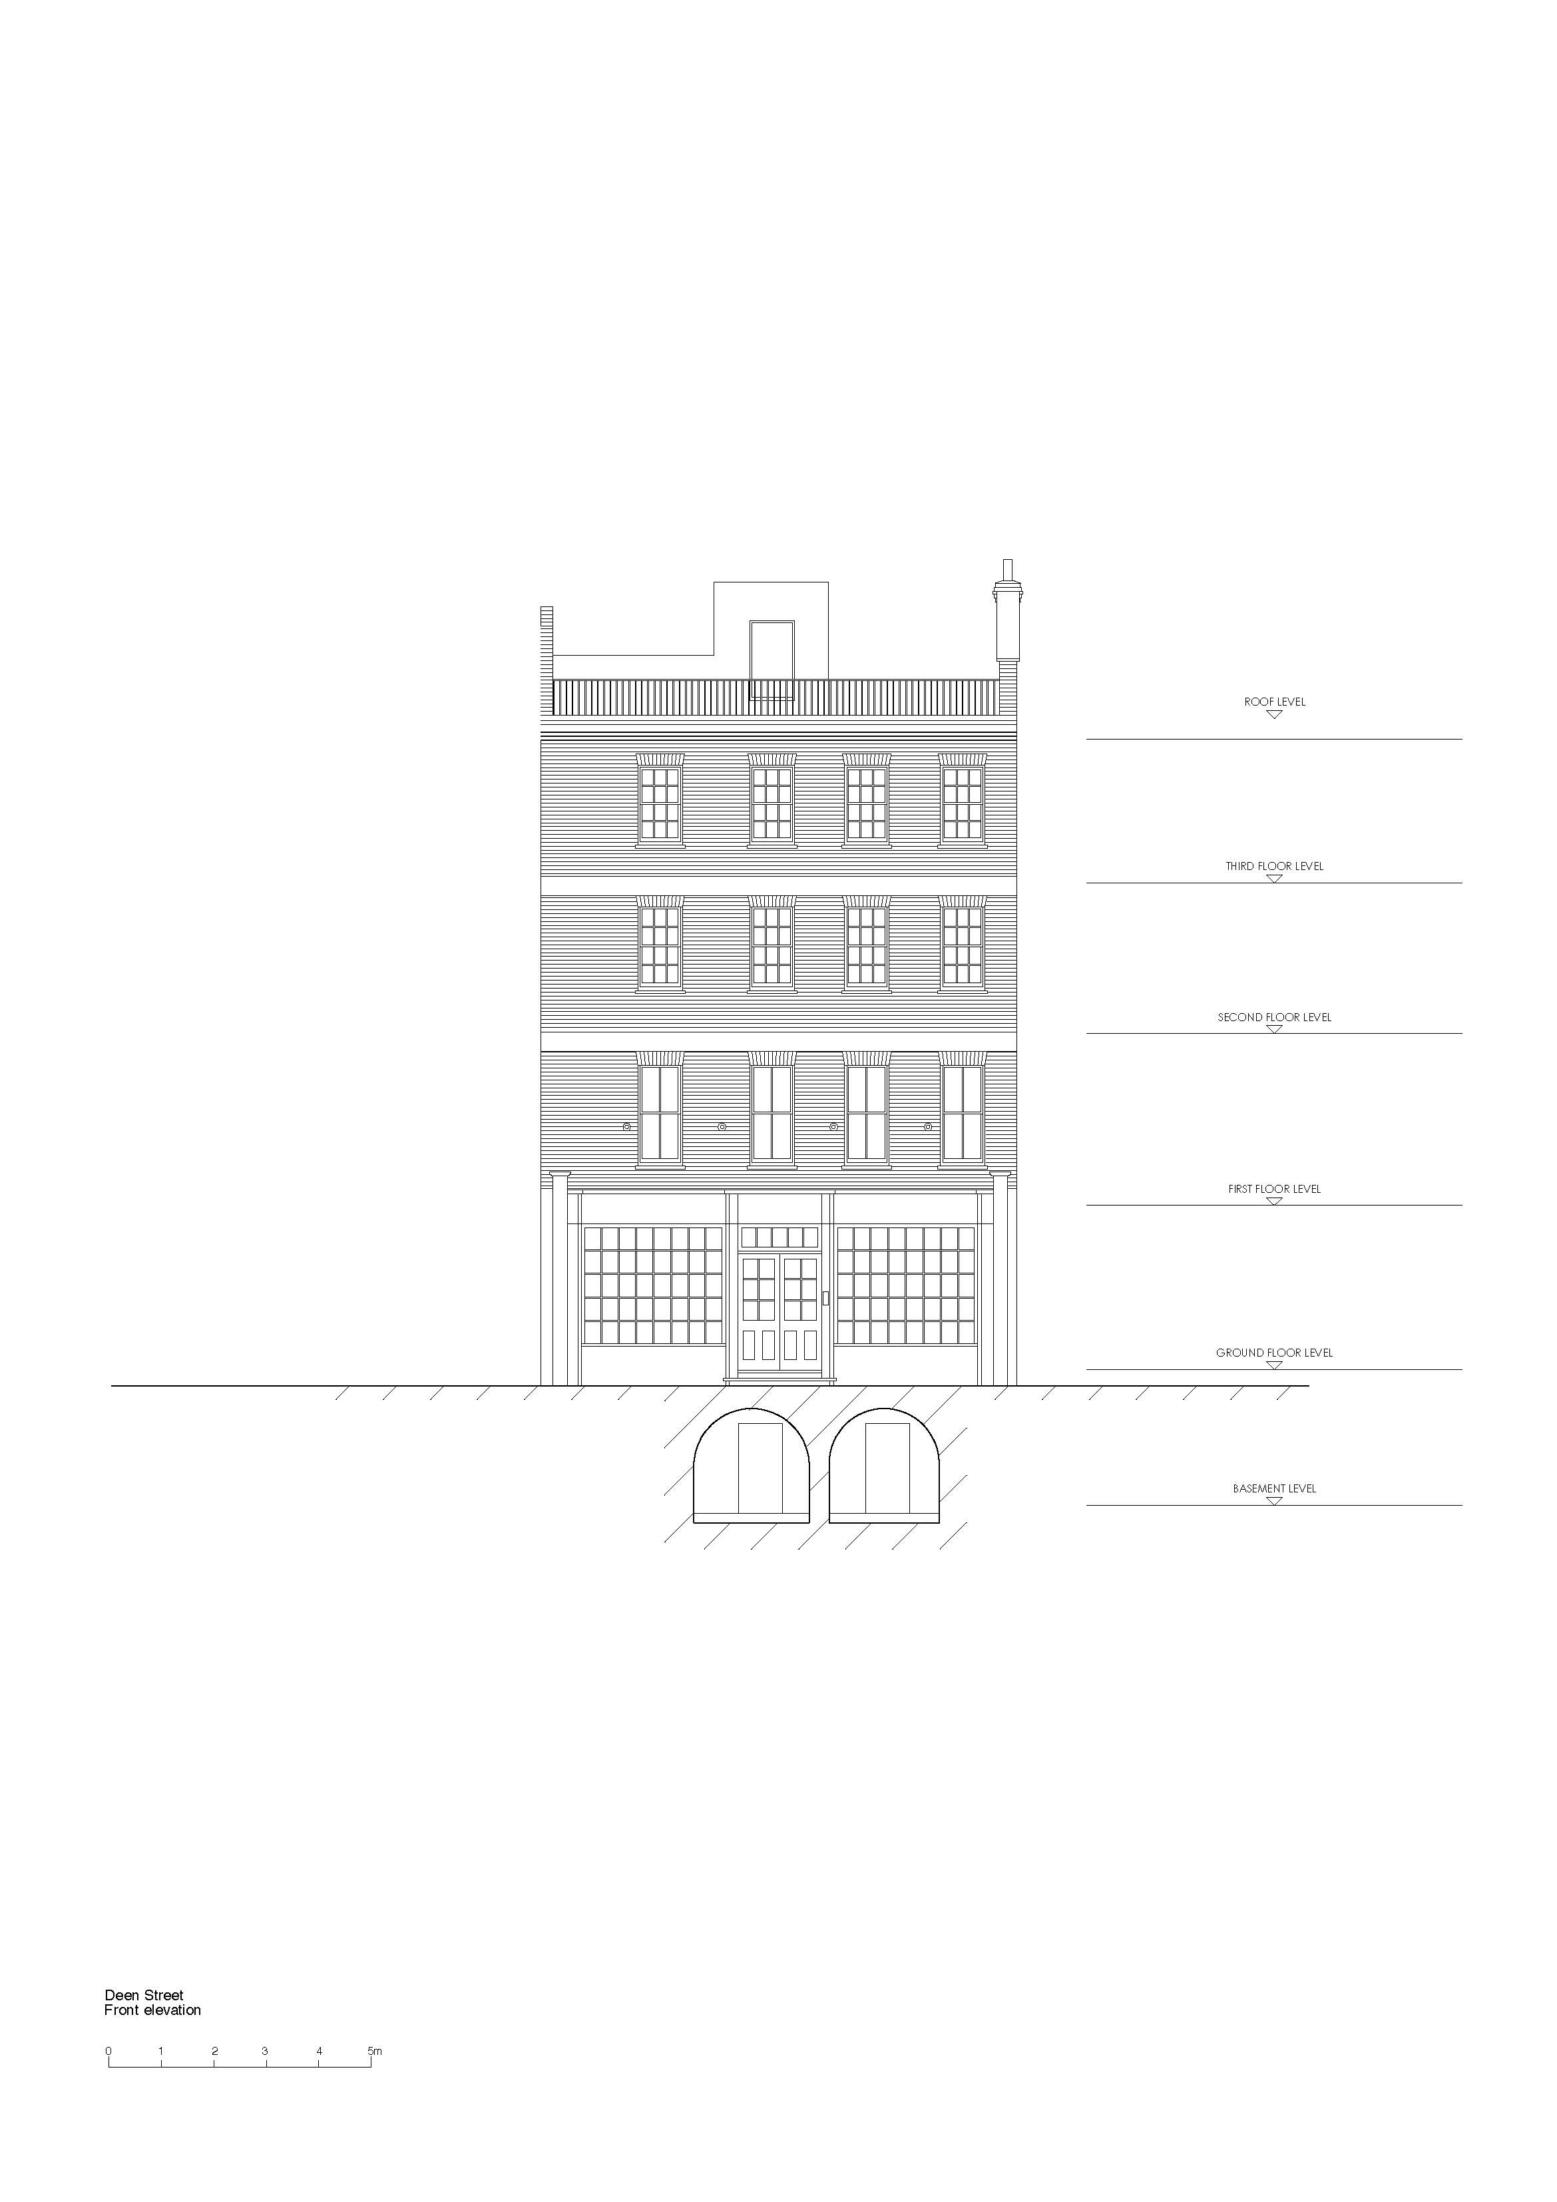 Dean Street elevation